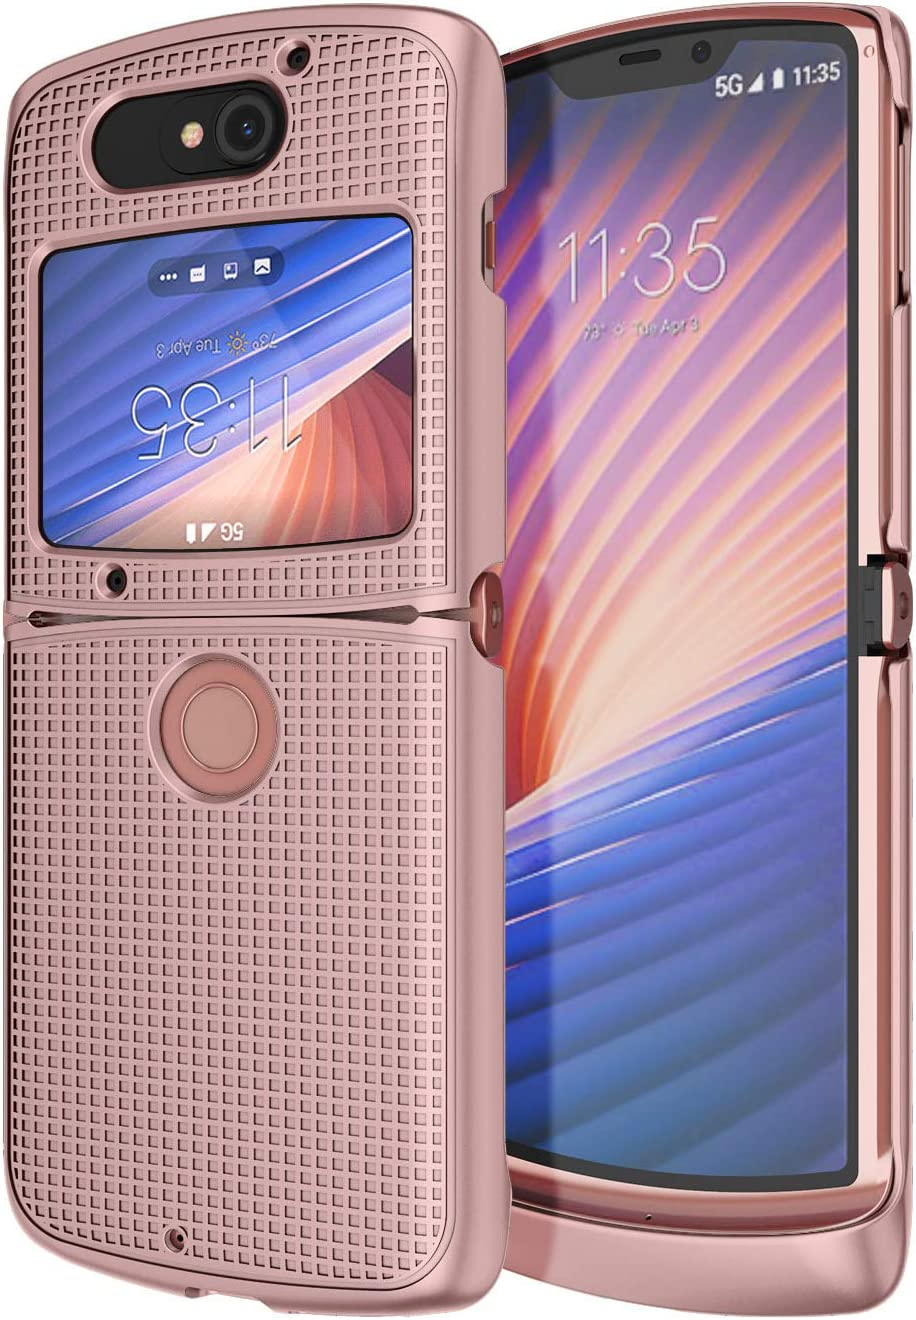 Case for Motorola RAZR 5G Flip Phone, Nakedcellphone [Rose Gold Pink] Protective Snap-On Hard Shell Cover [Grid Texture] for Motorola Moto RAZR 5G Flip Phone (2020) XT2071